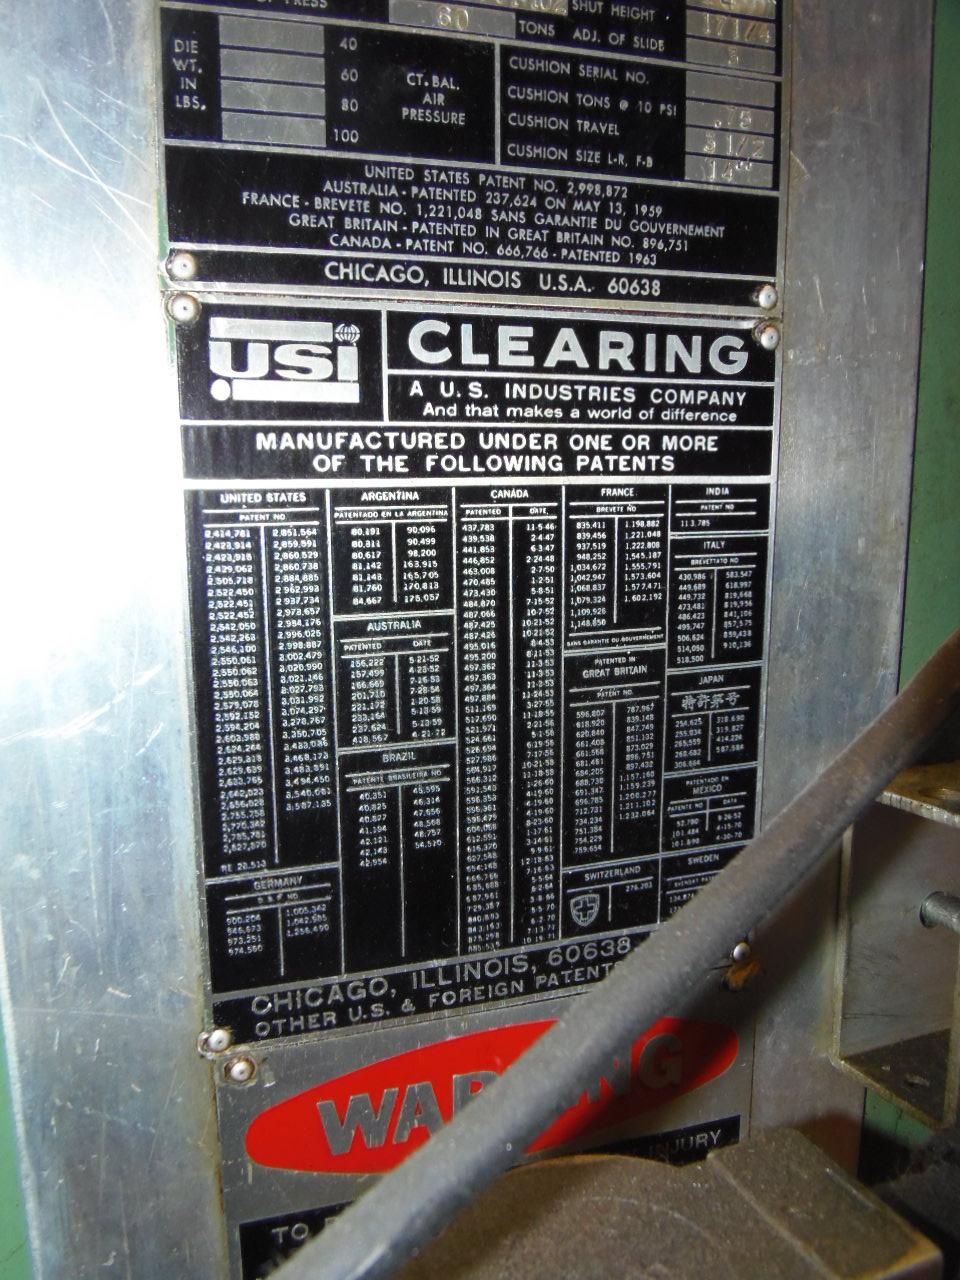 "60 TON - USI CLEARING (TORC-PAC), O.B.I. PRESS, 4"" STROKE, 60 SPM, 3"" ADJUSTMENT, 17 1/4"" SHUT HEIGHT, 1973"